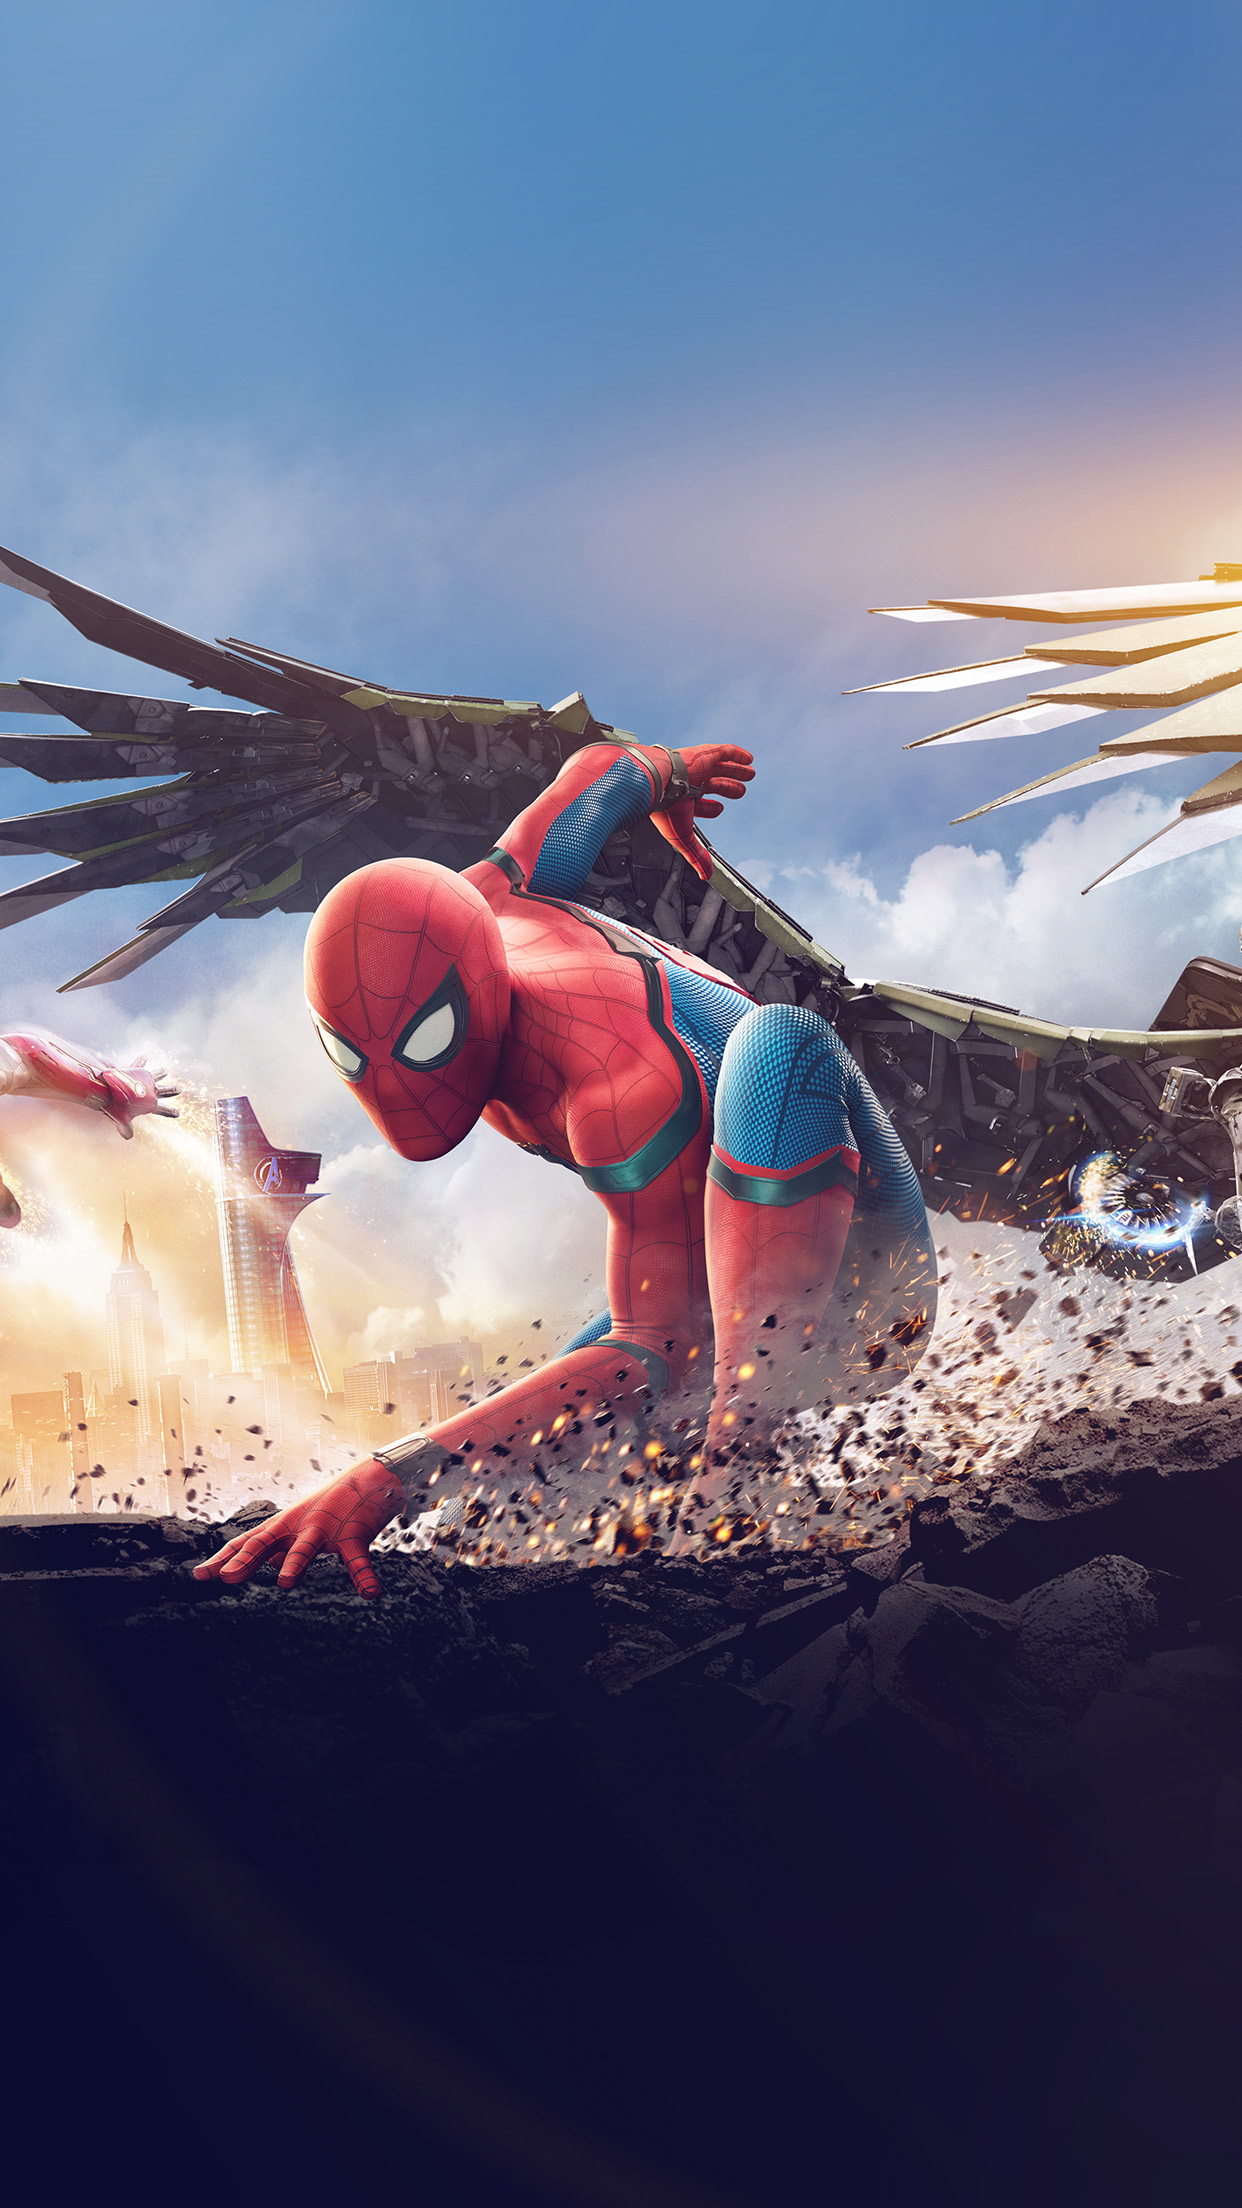 Marvel Iphone X Wallpaper Hd , HD Wallpaper & Backgrounds